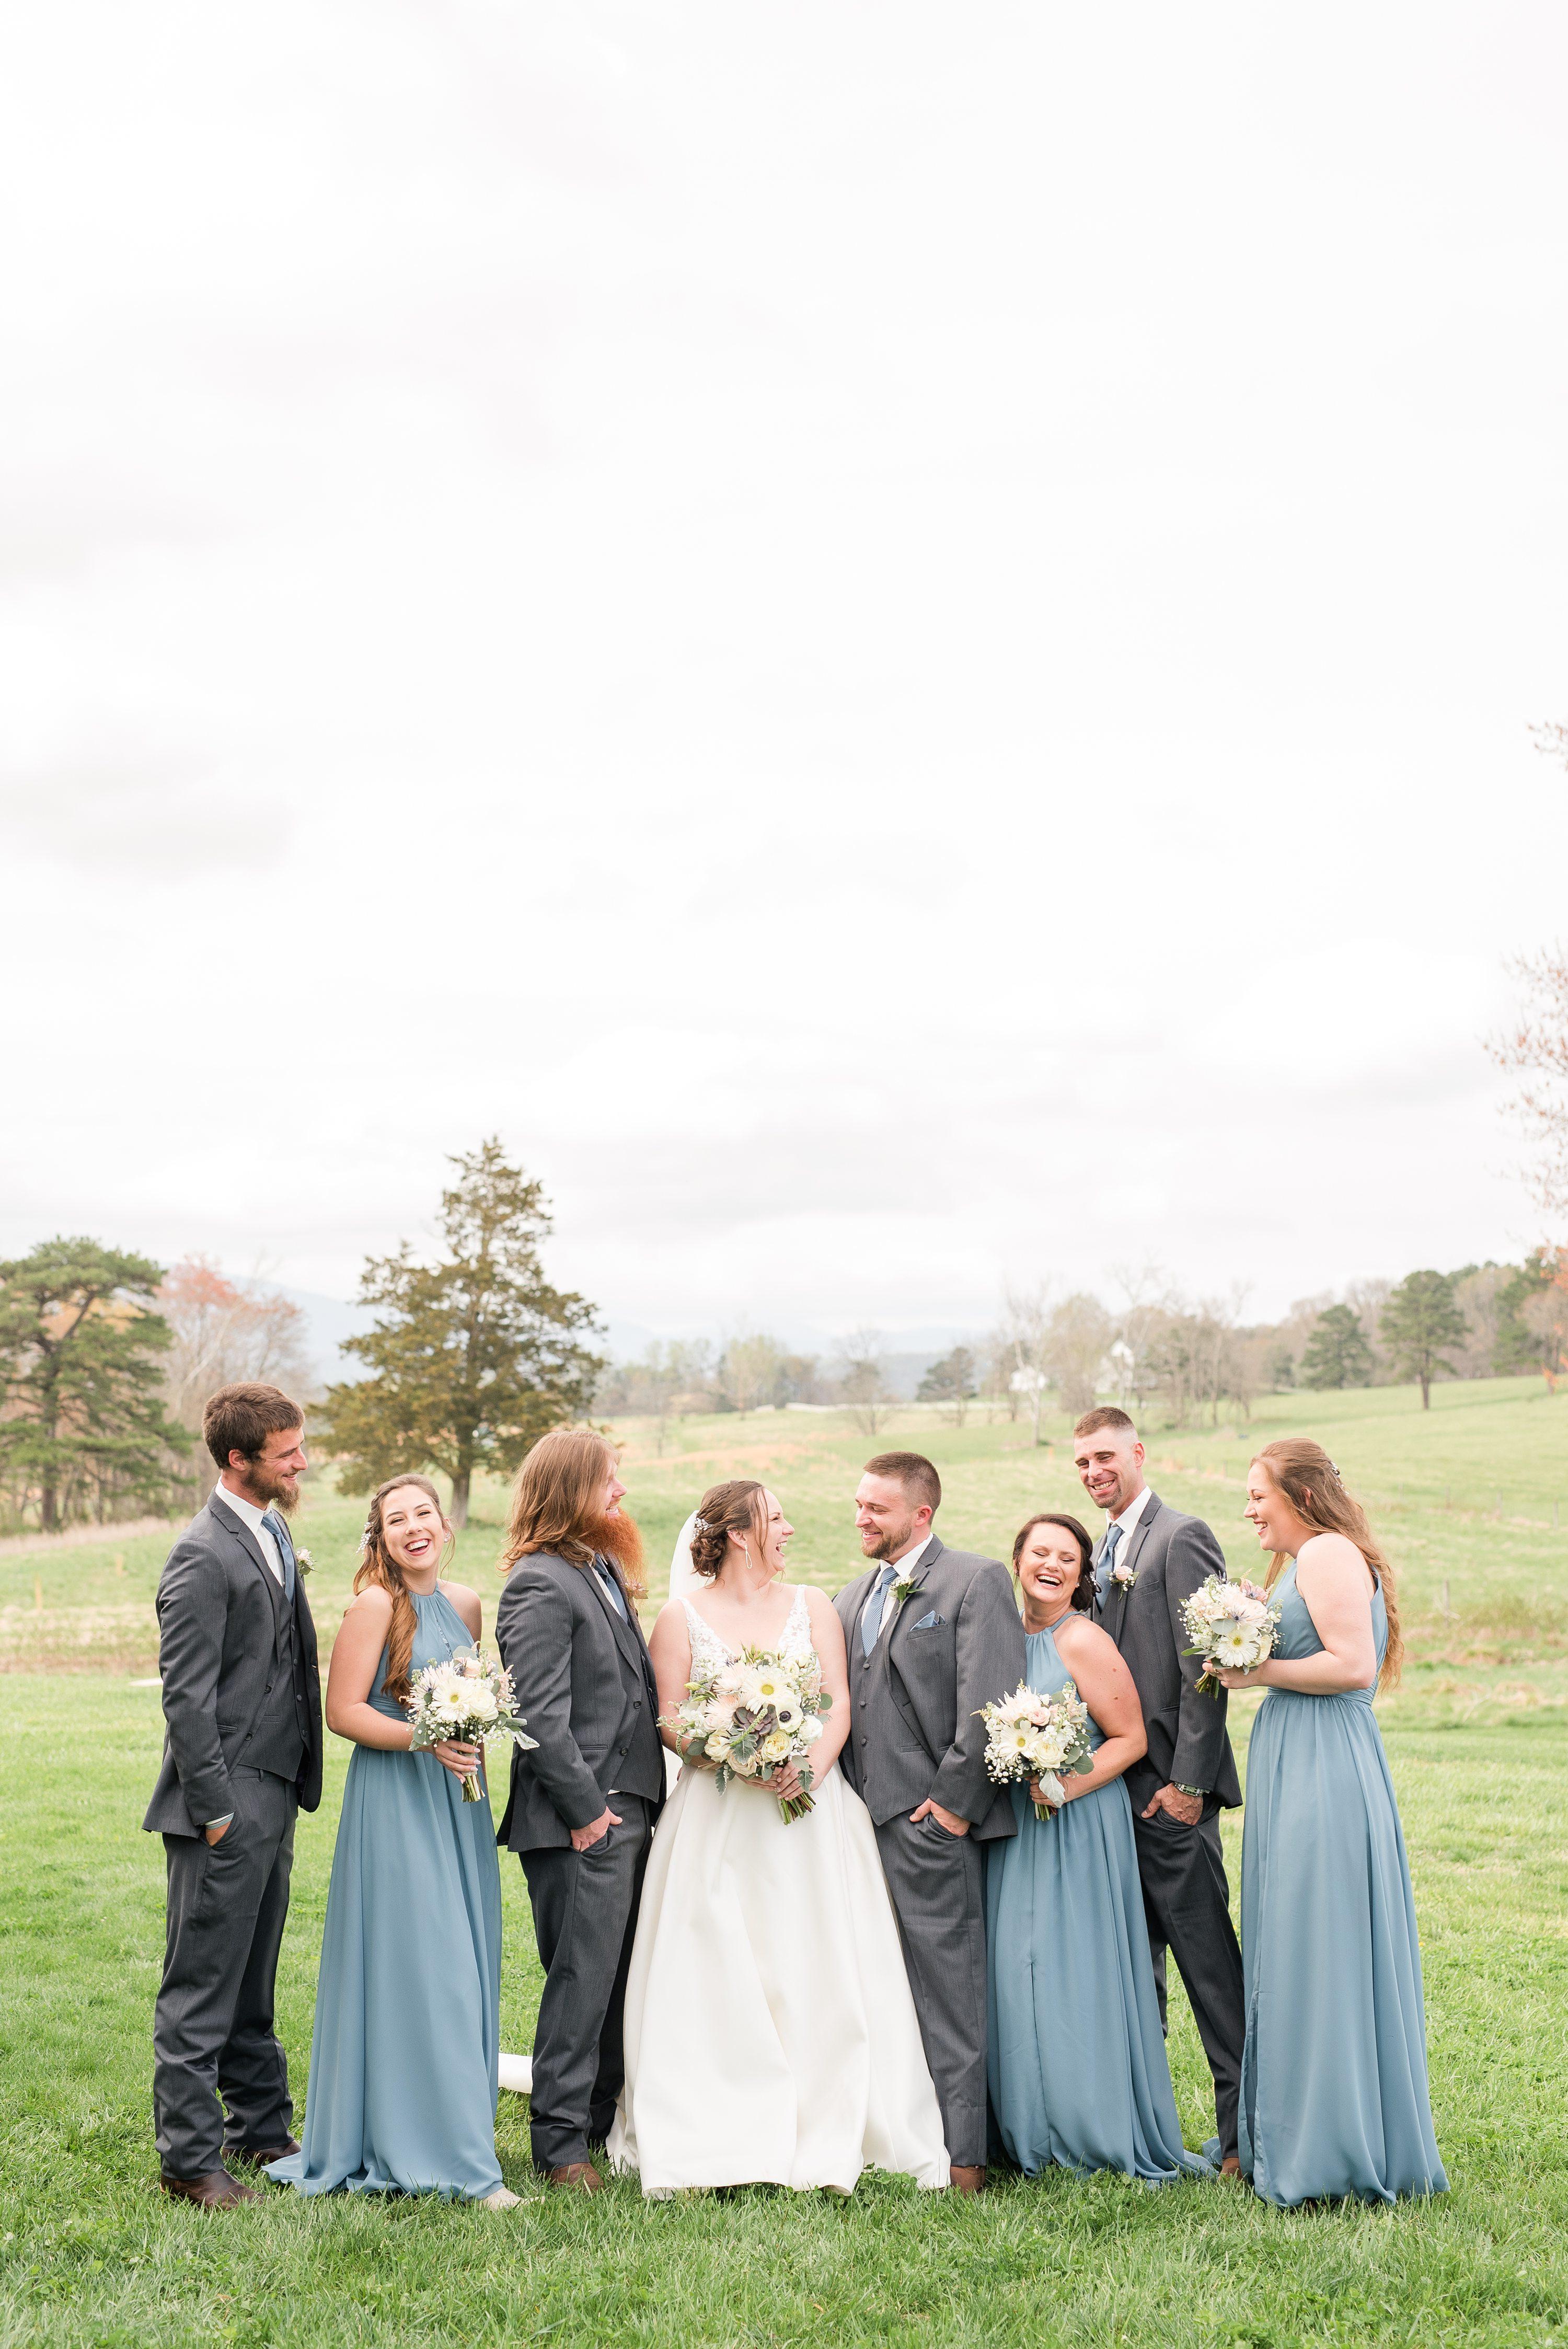 Edgewood,Charlottesville,bridal party